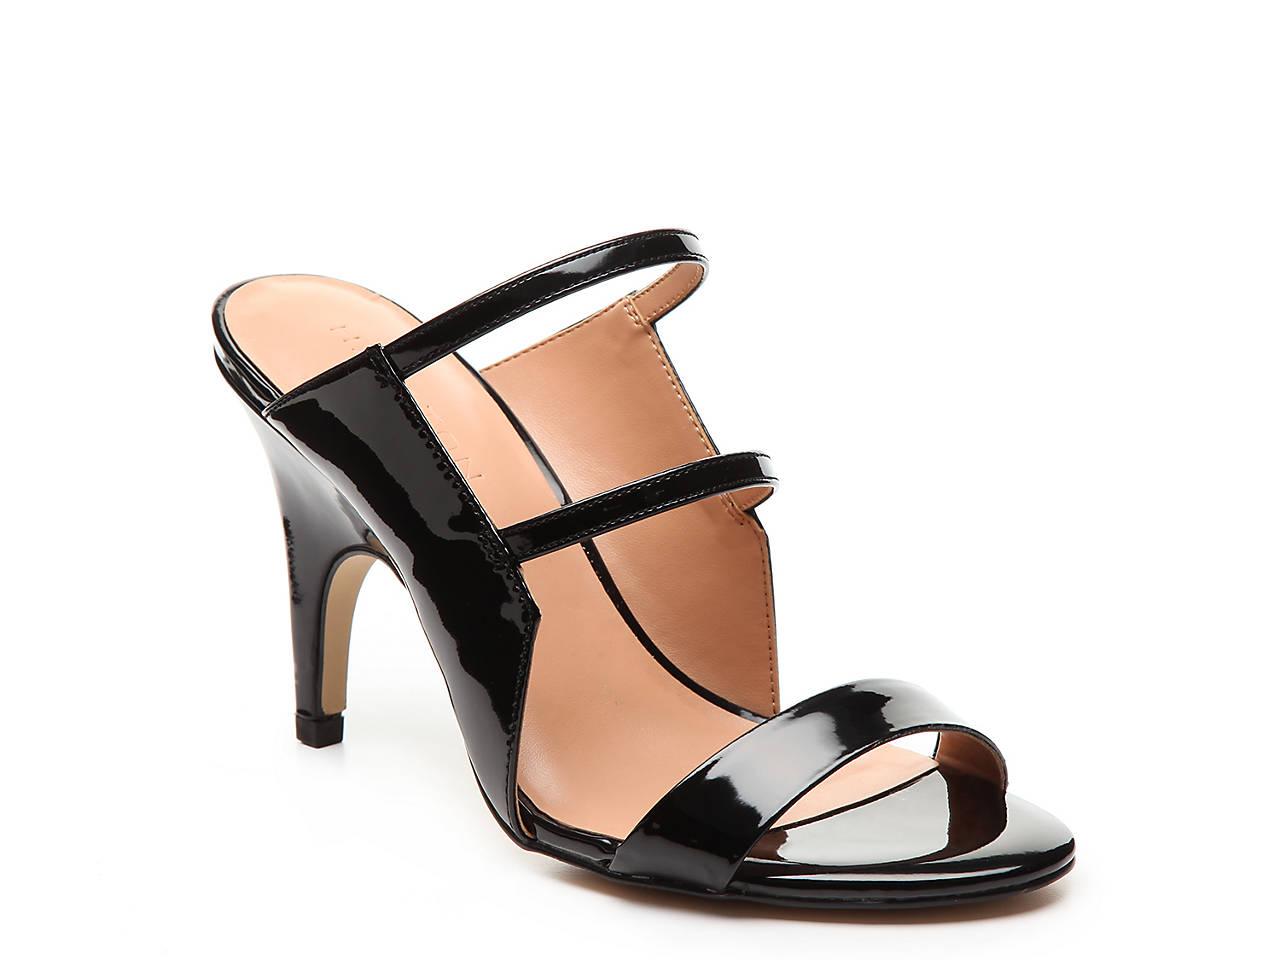 76eff33b74b6 Halston Heritage Michaela Sandal Women s Shoes